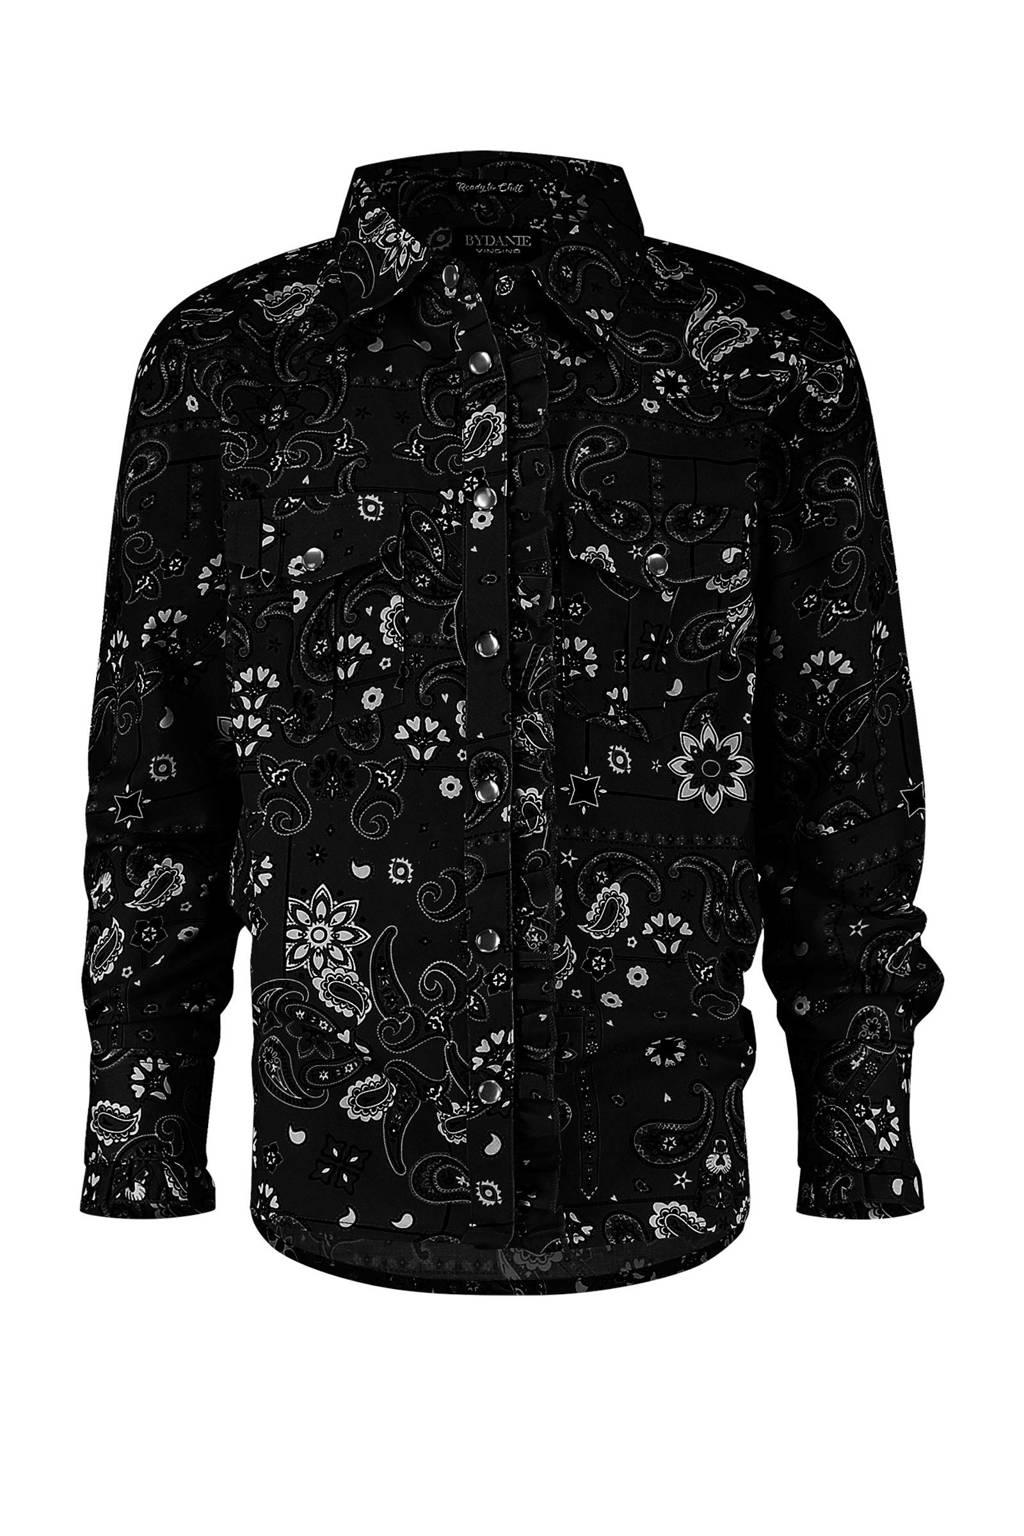 Vingino blouse Lucile met all over print zwart/wit, Zwart/wit